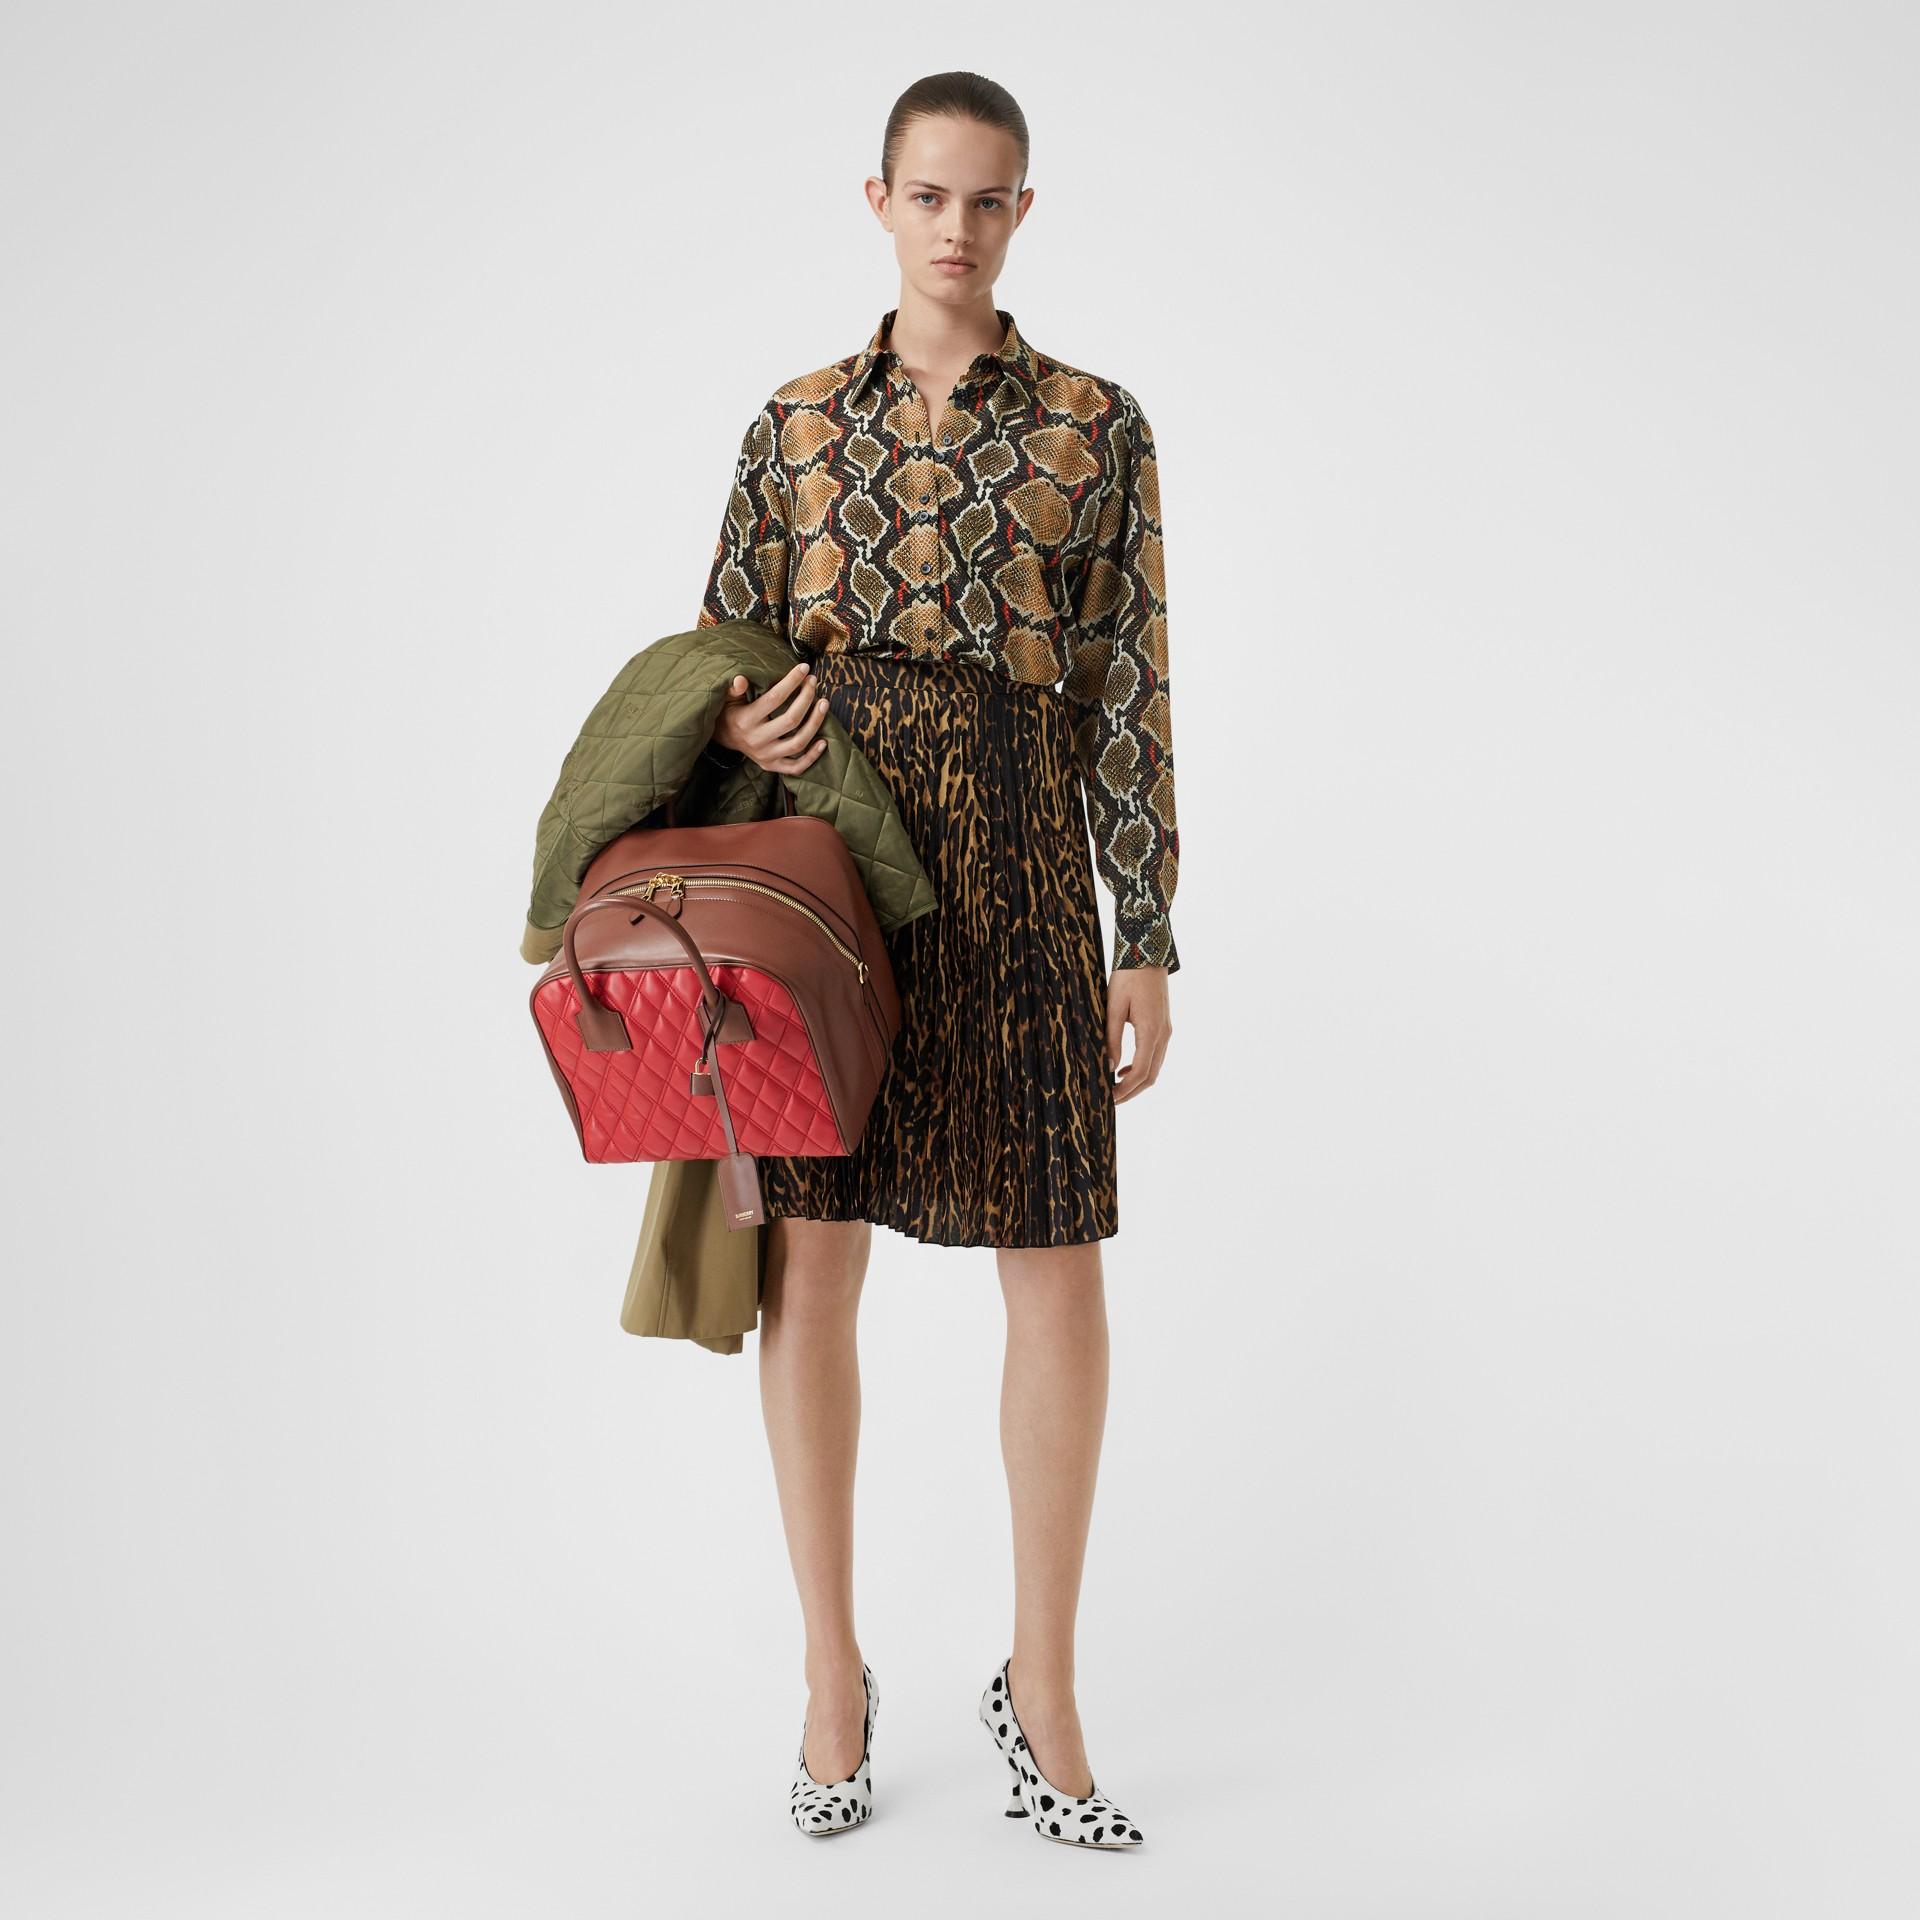 Python Print Silk Shirt in Soft Cocoa - Women | Burberry United Kingdom - gallery image 4